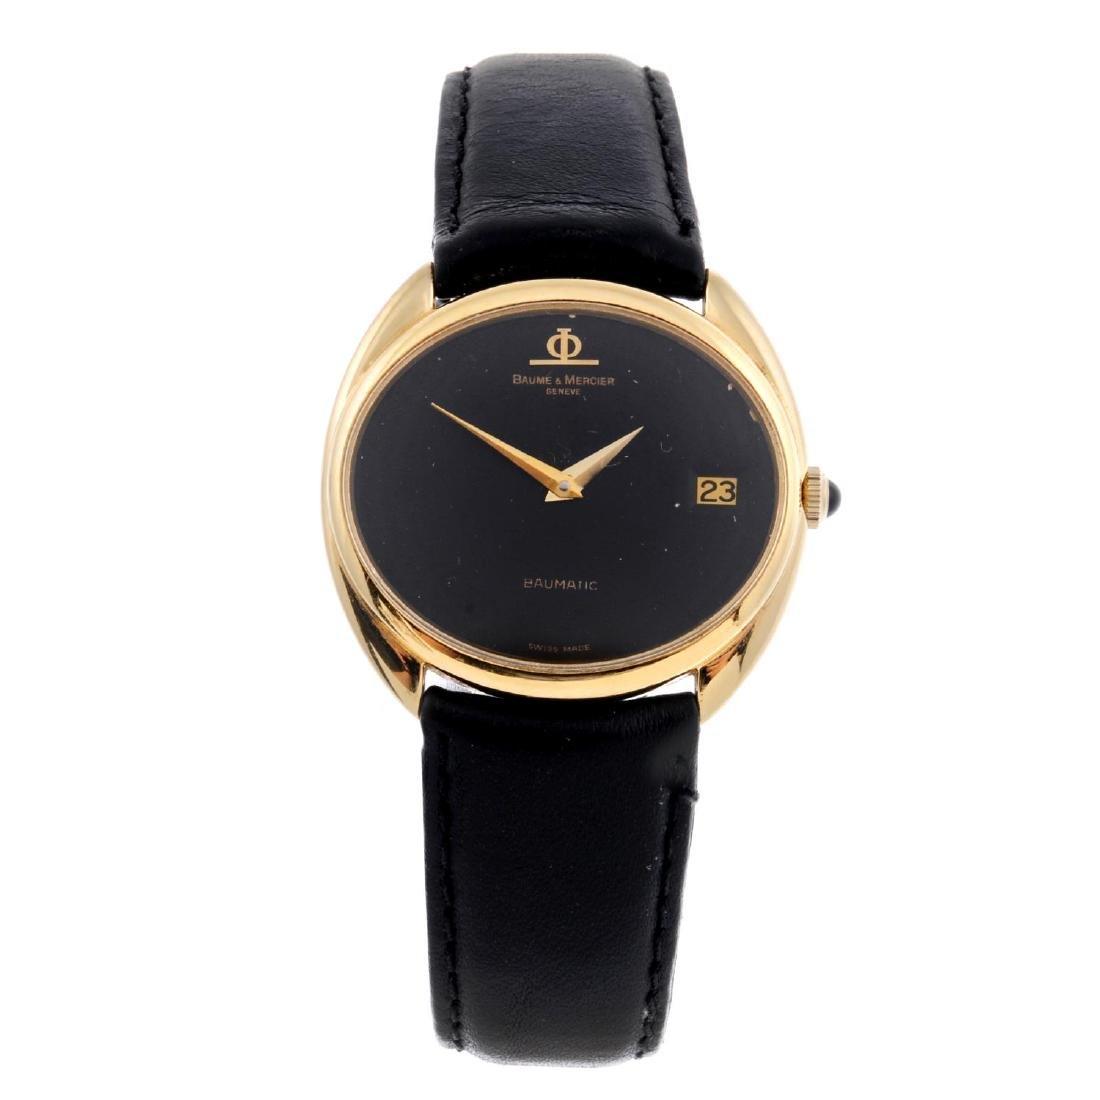 BAUME & MERCIER - a gentleman's Baumatic wrist watch.